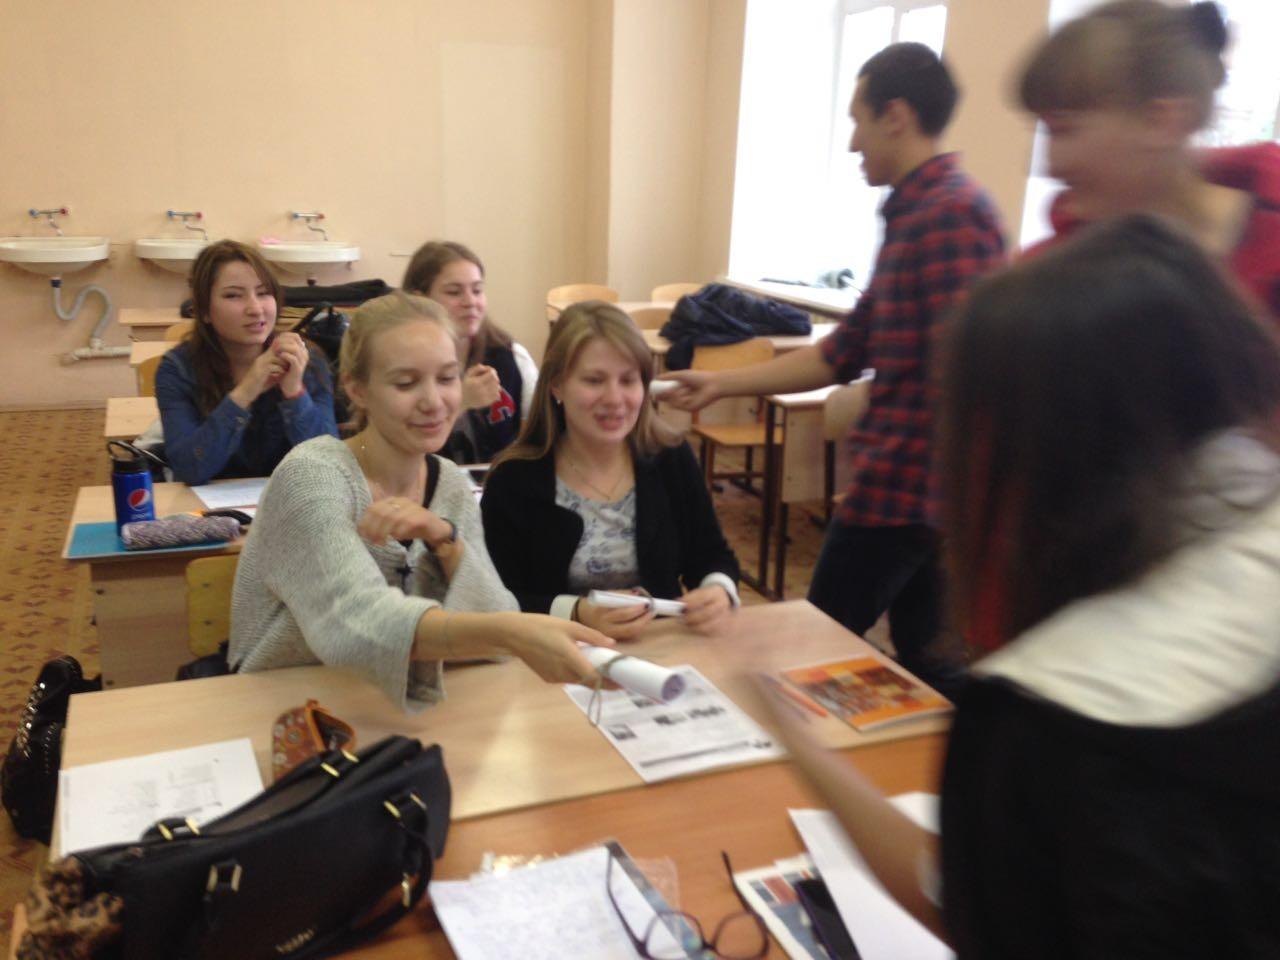 знакомство со студентами первого курса